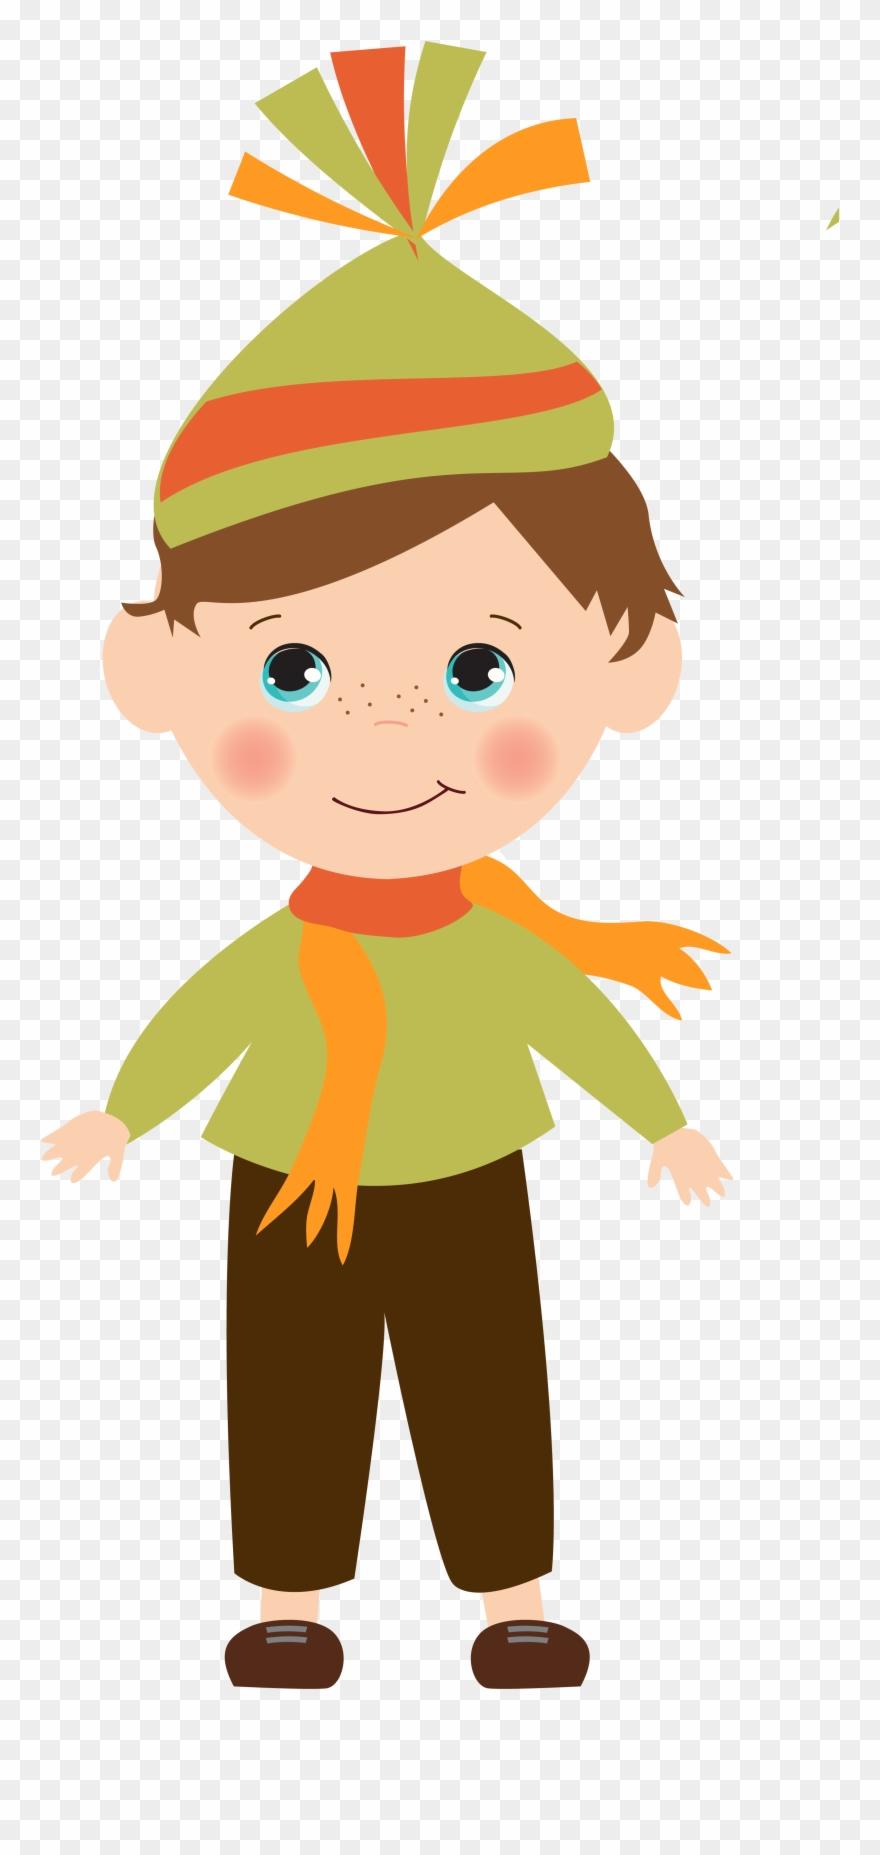 medium resolution of fall fun fall fun for kids autumn clipart